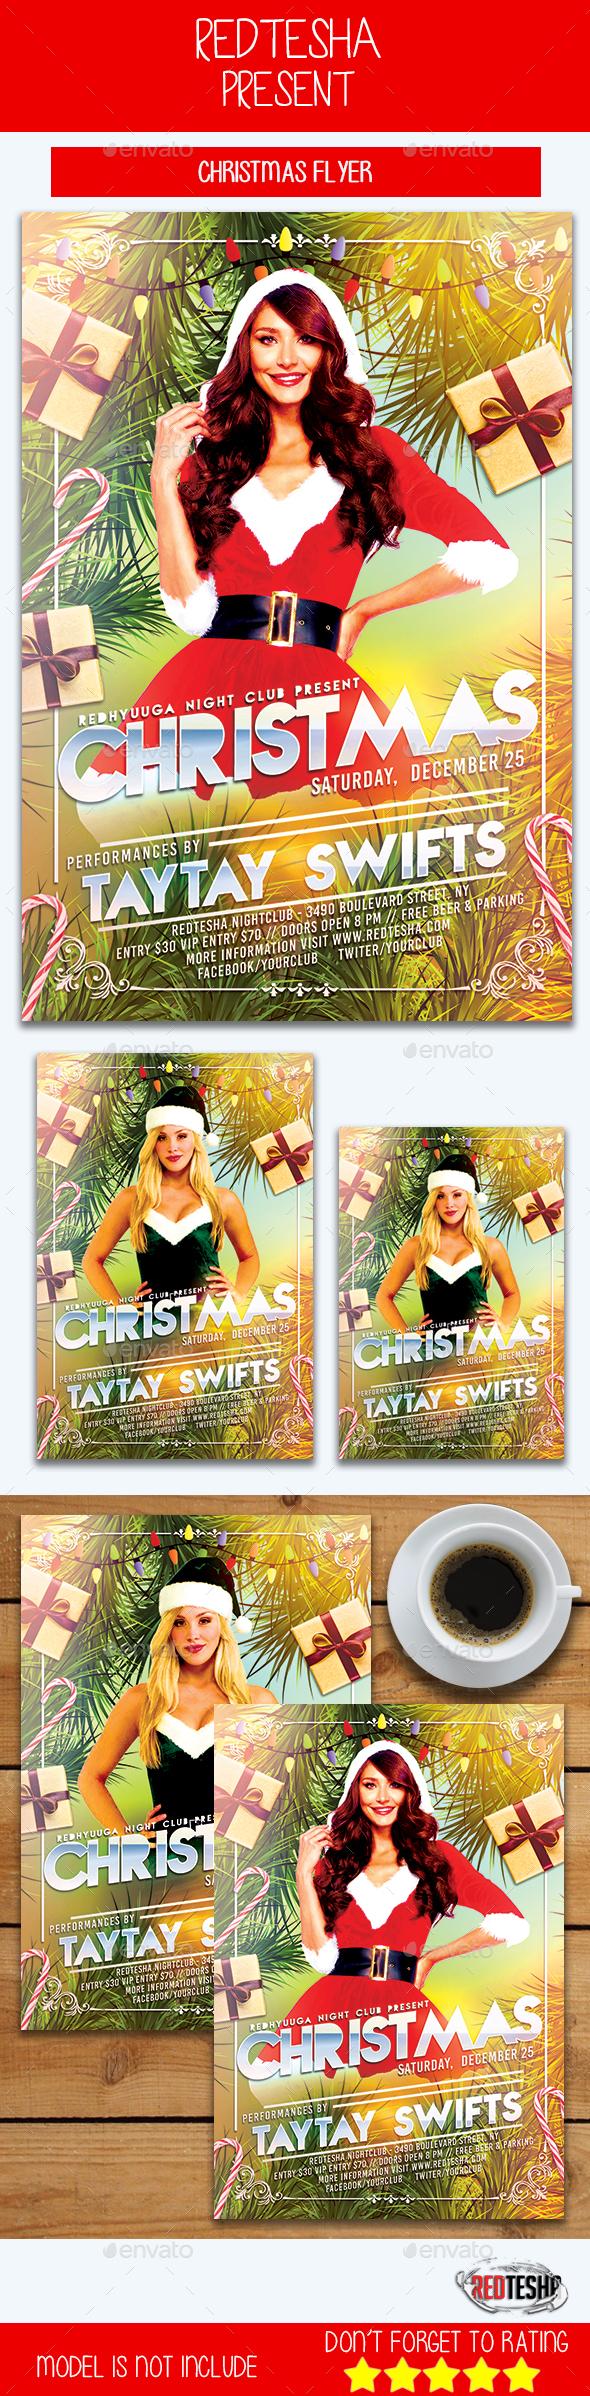 GraphicRiver Christmas Flyer 21159782